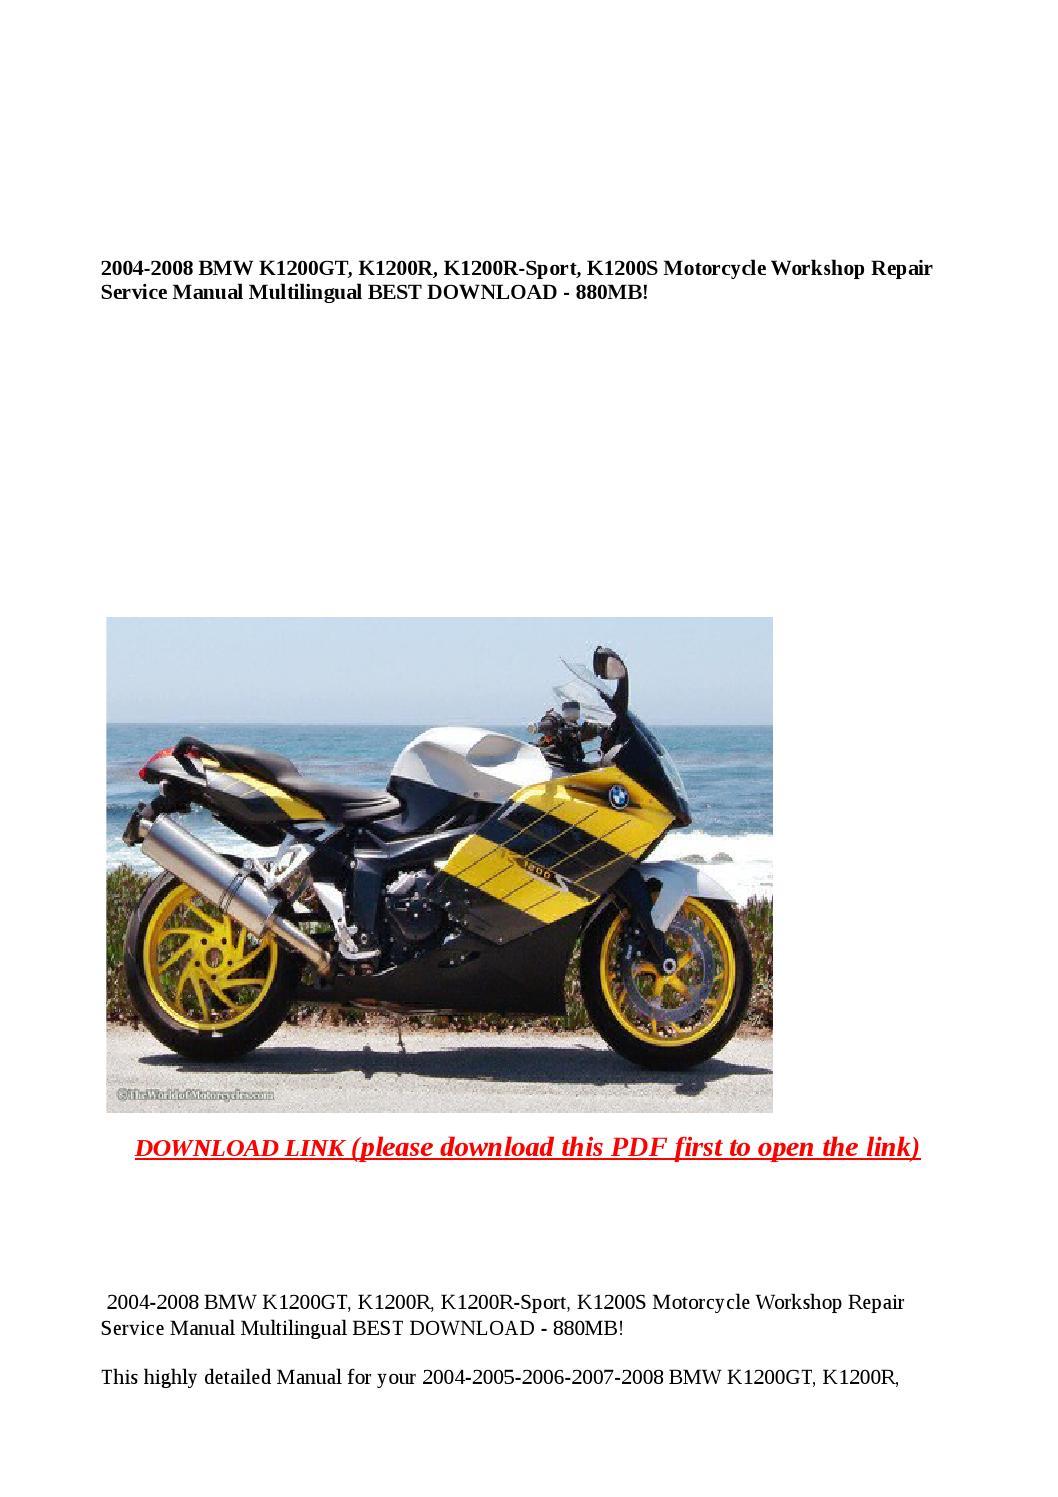 OX_1618] Bmw K 1200 Wiring Diagram Hone Xlexi Rous Oxyt Pap Mohammedshrine Librar Wiring 101